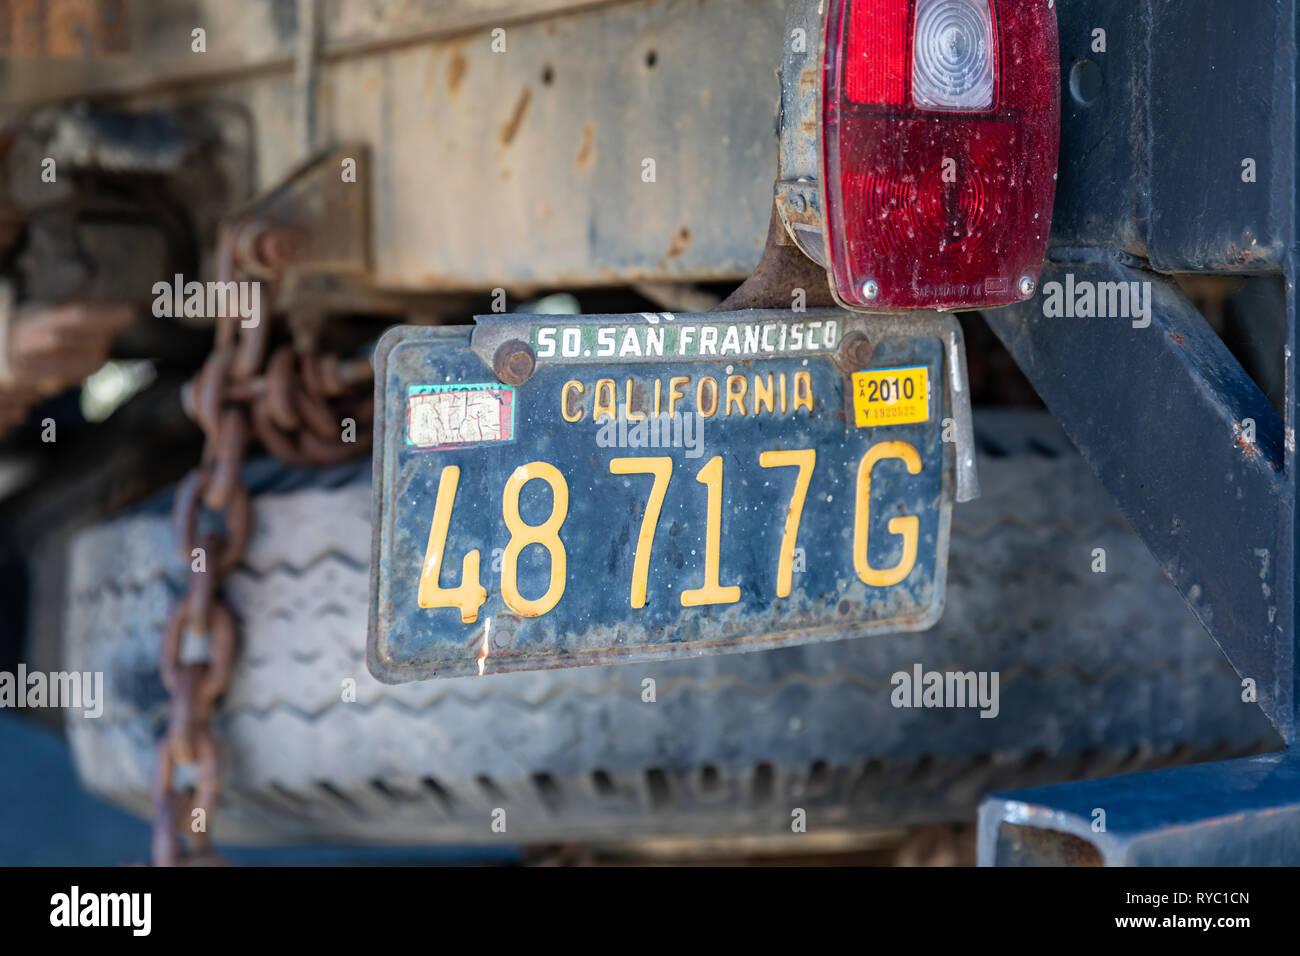 SAN FRANCISCO California Metal CA License Plate